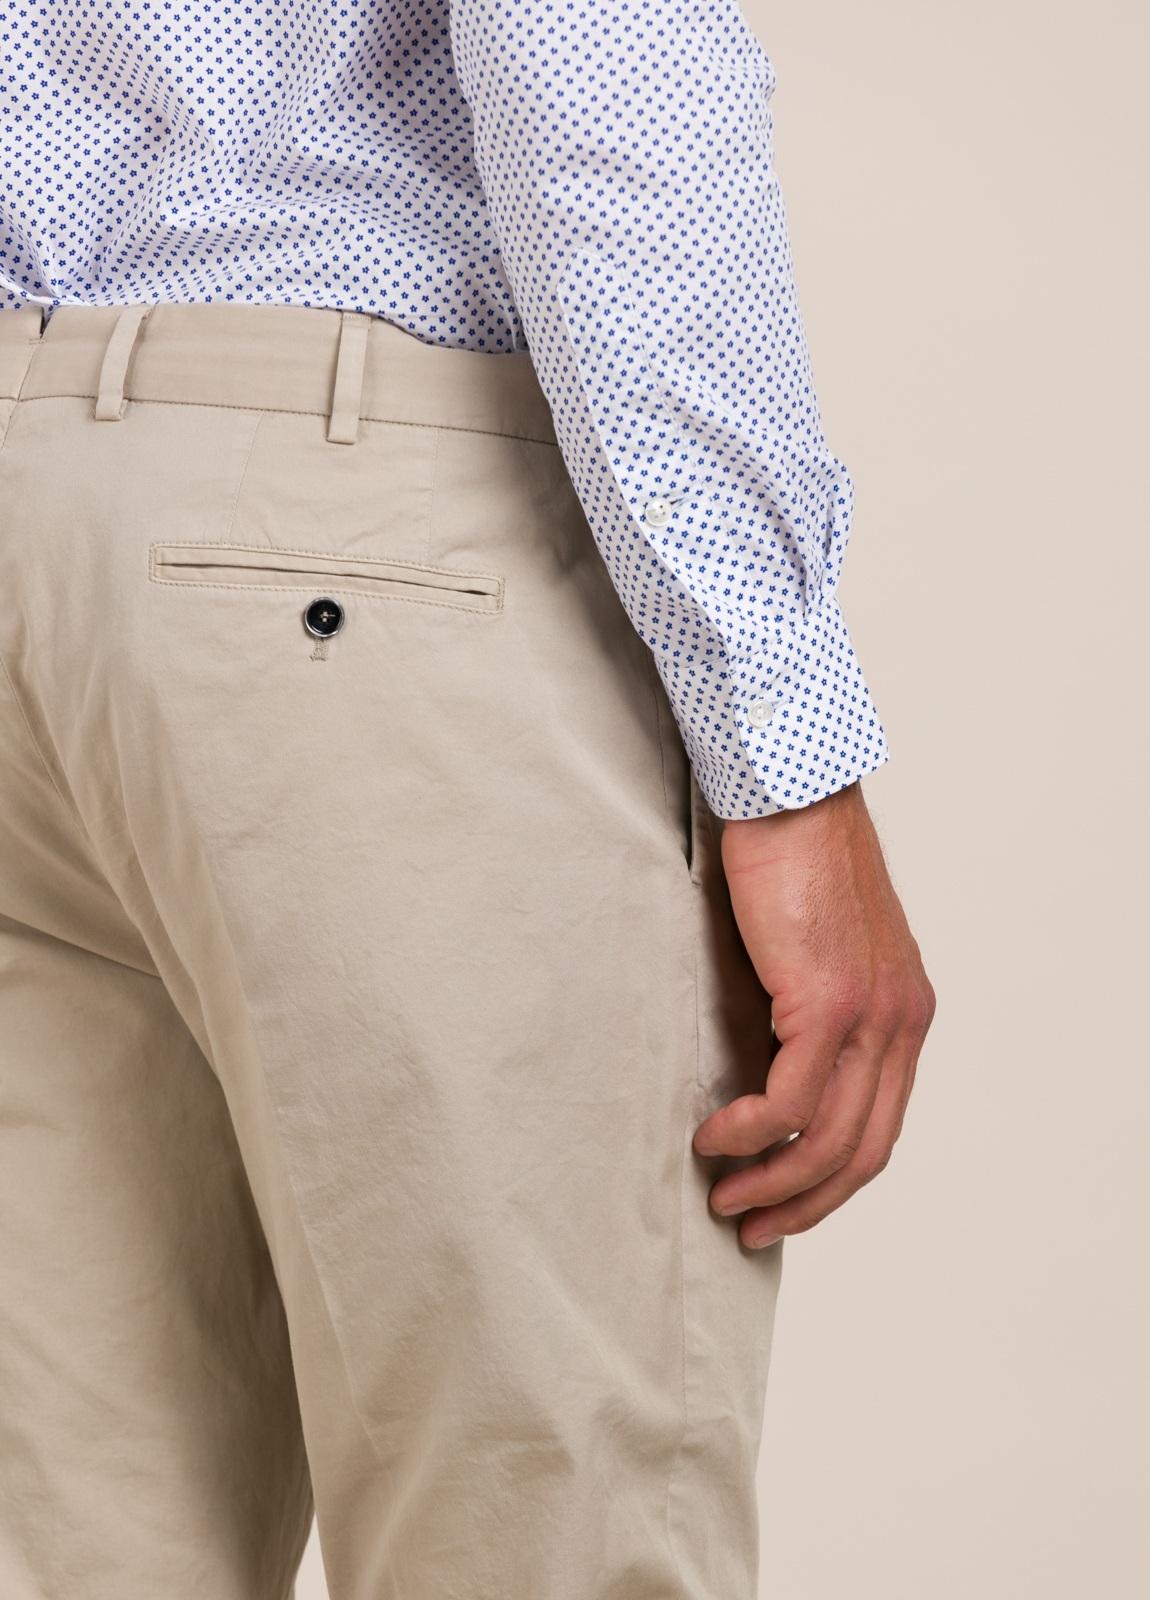 Pantalón chino FUREST COLECCIÓN Slim Fit beige - Ítem1